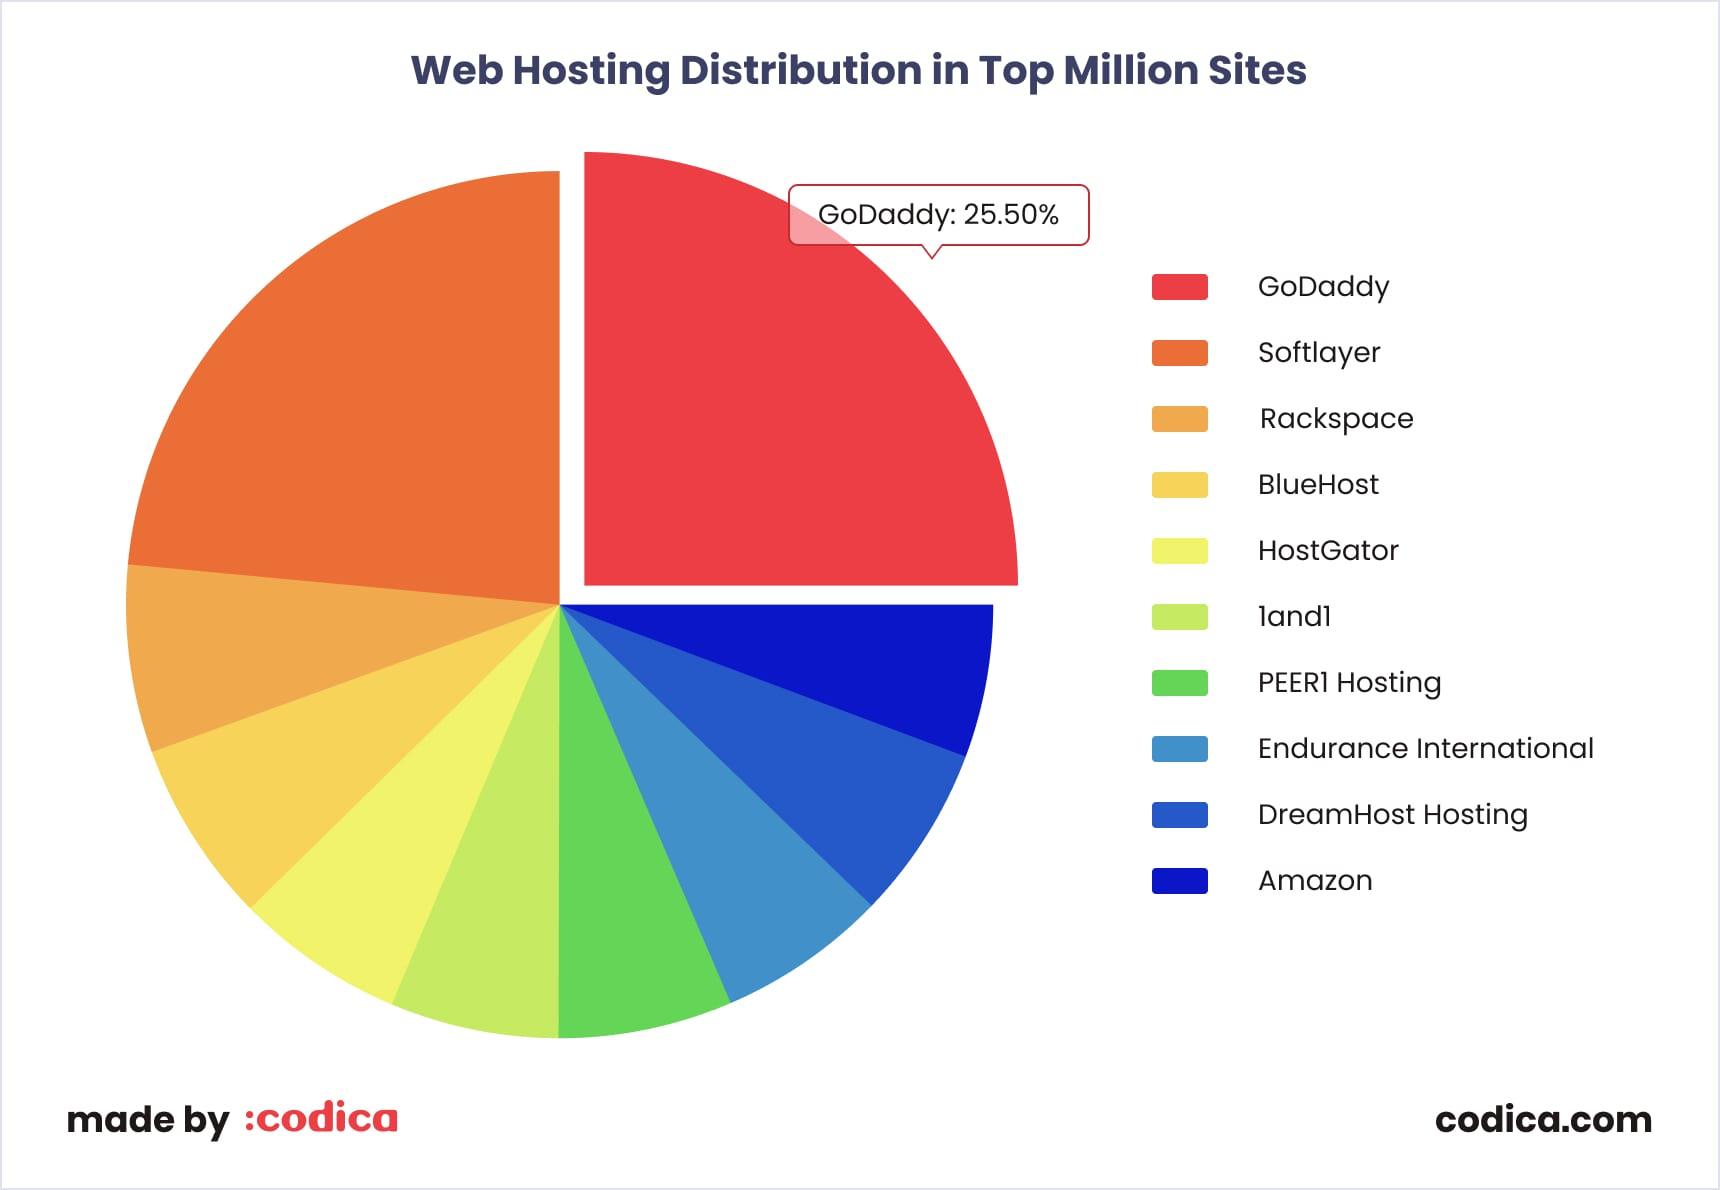 Top web hosting service providers' distribution